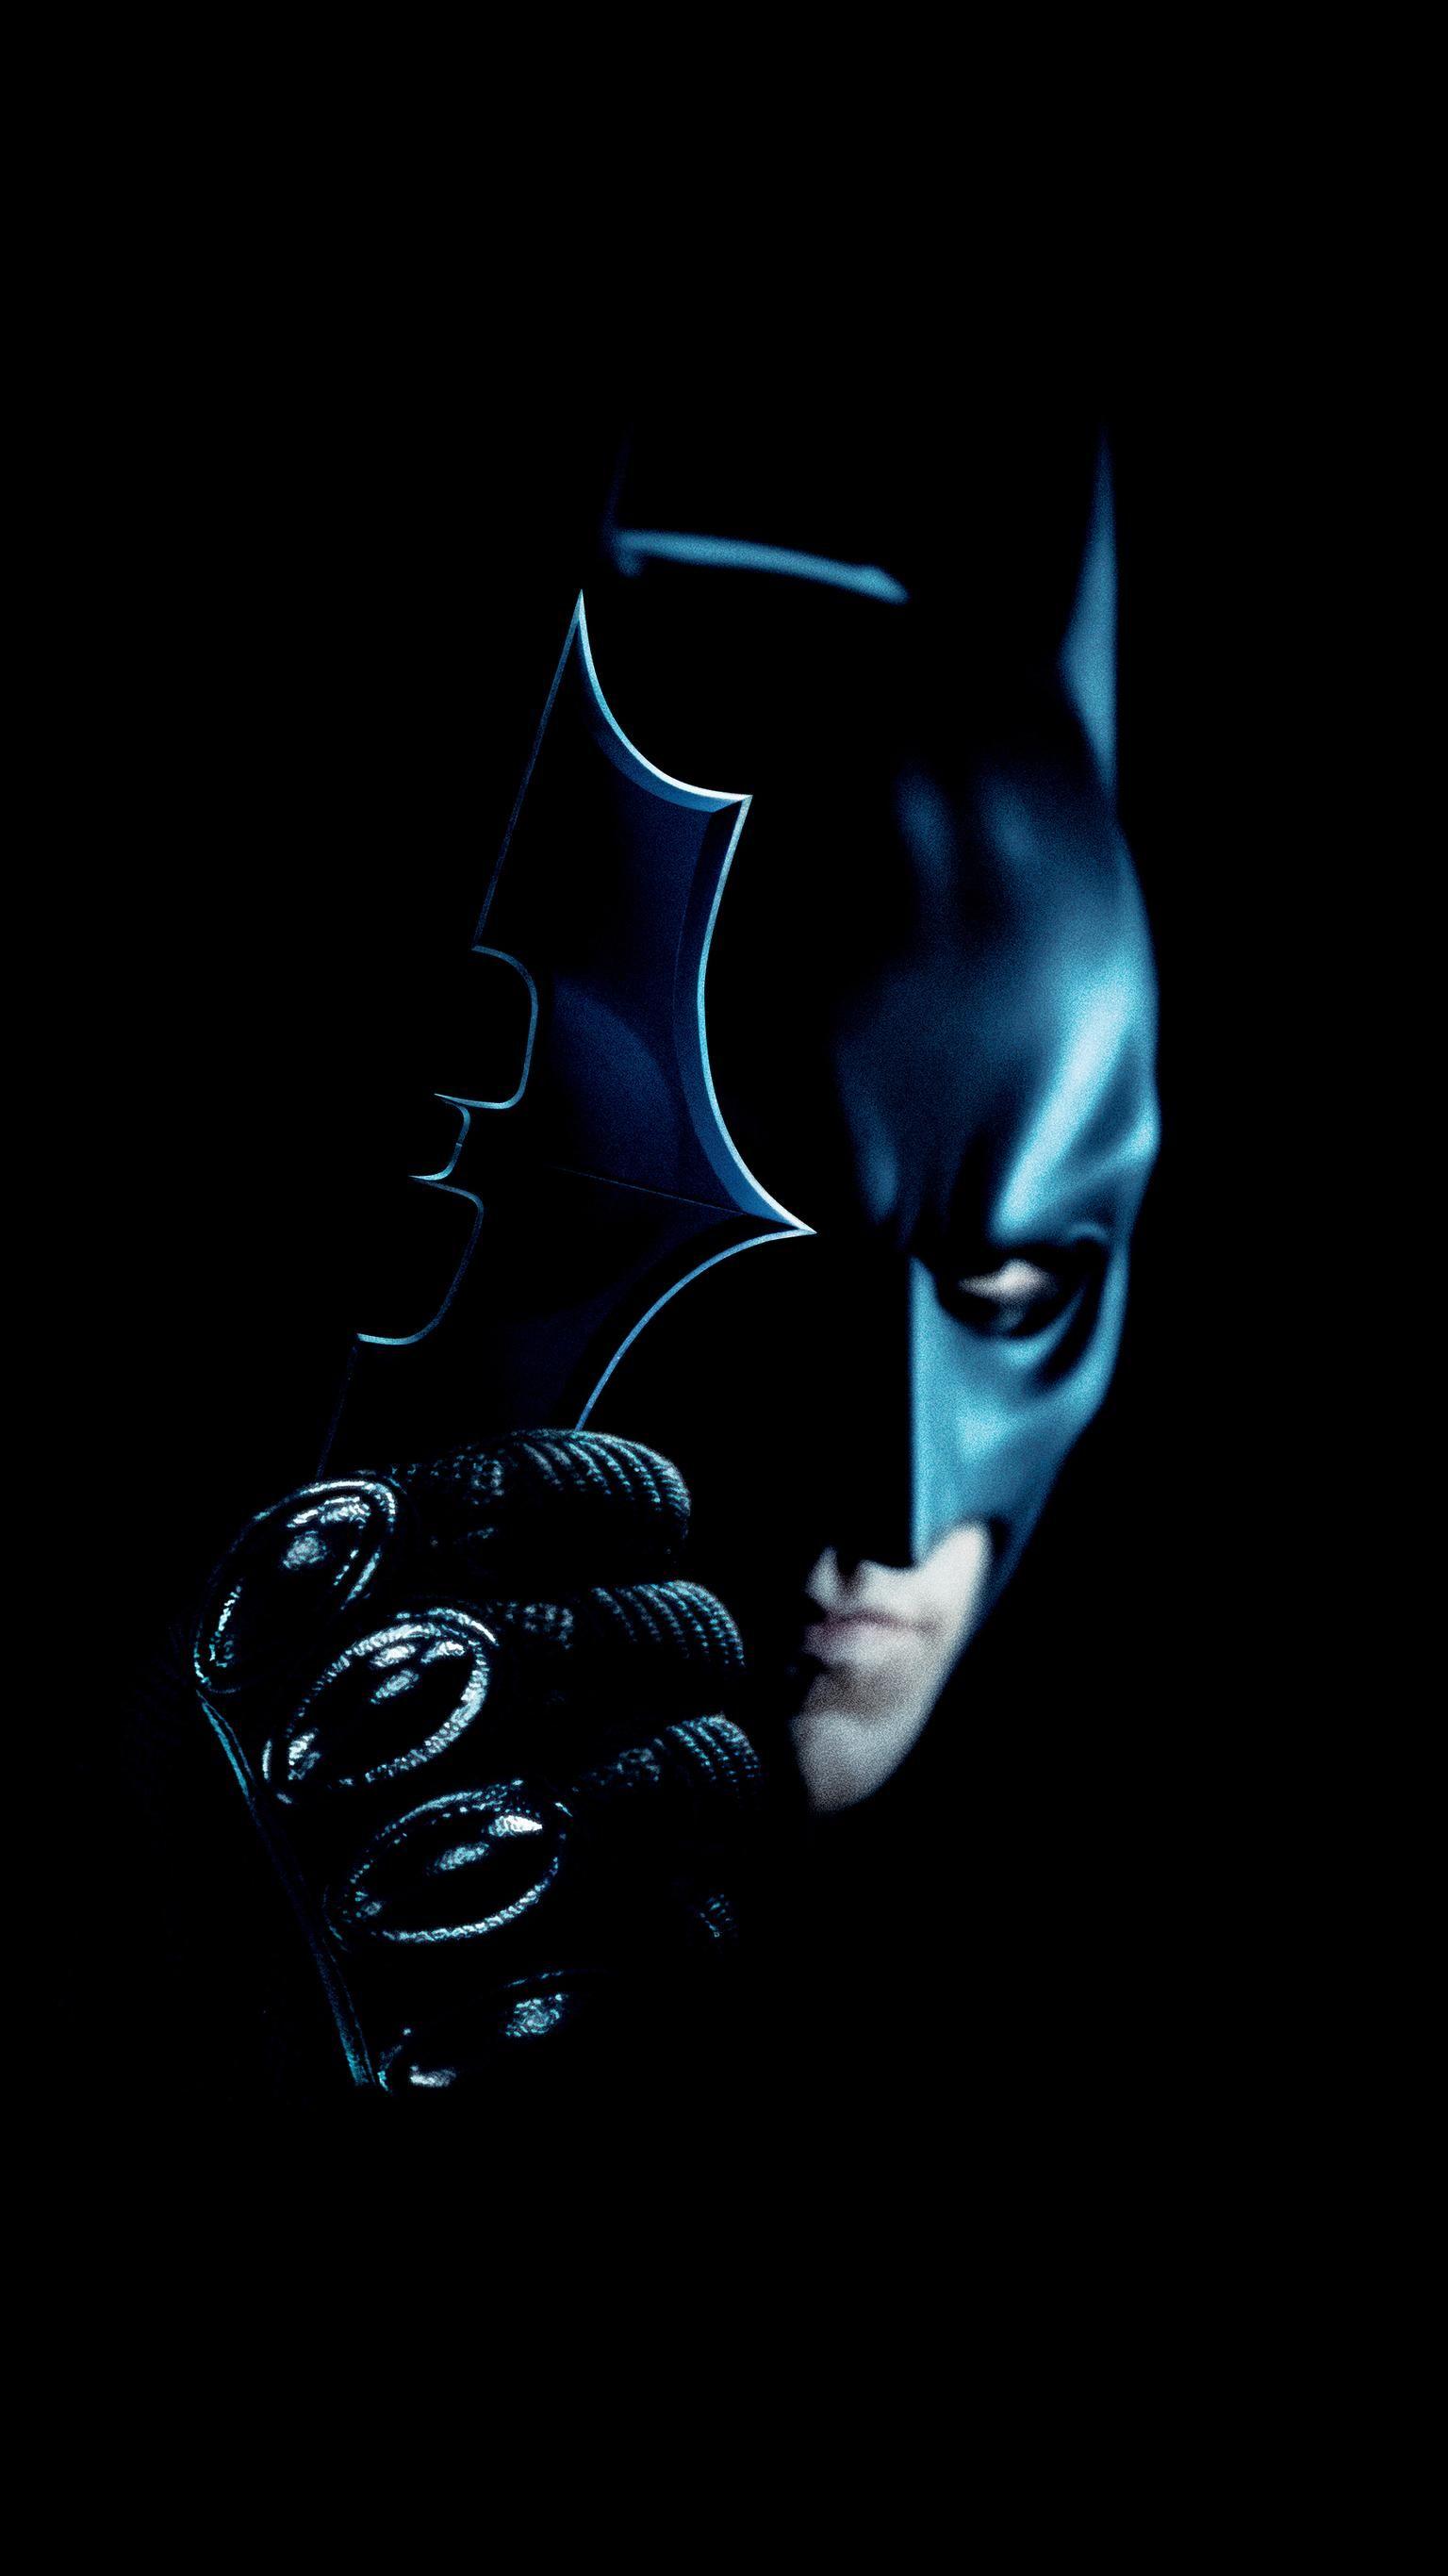 The Dark Knight 2008 Phone Wallpaper Dark Knight Wallpaper Batman The Dark Knight Batman Wallpaper